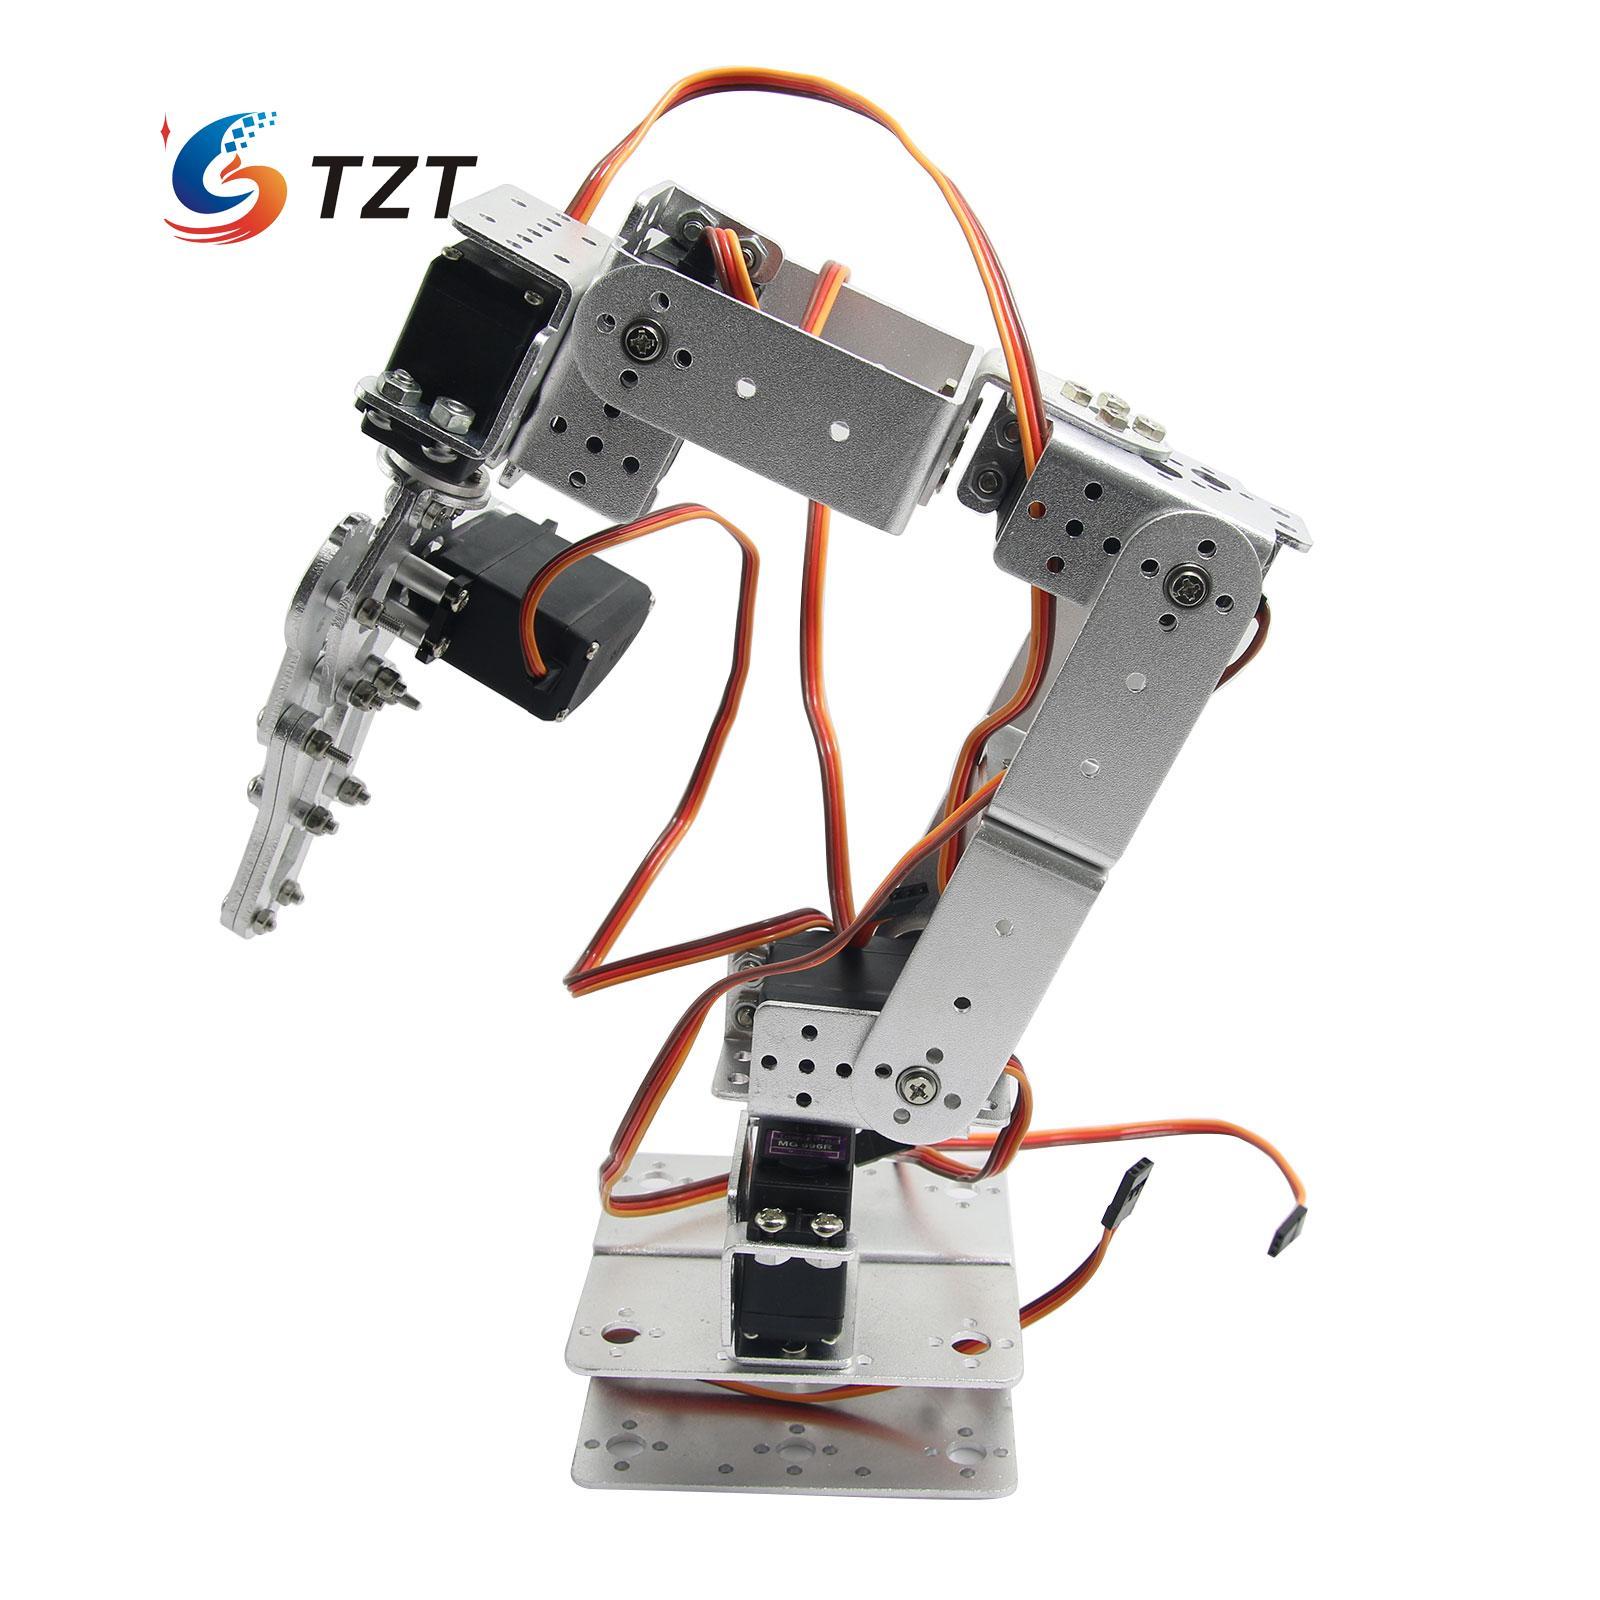 Aluminium Robot 6 DOF Arm Mechanical Robotic Arm Clamp Claw Mount Kit w/ Servos Servo Horn for Arduino-Silver  цена и фото